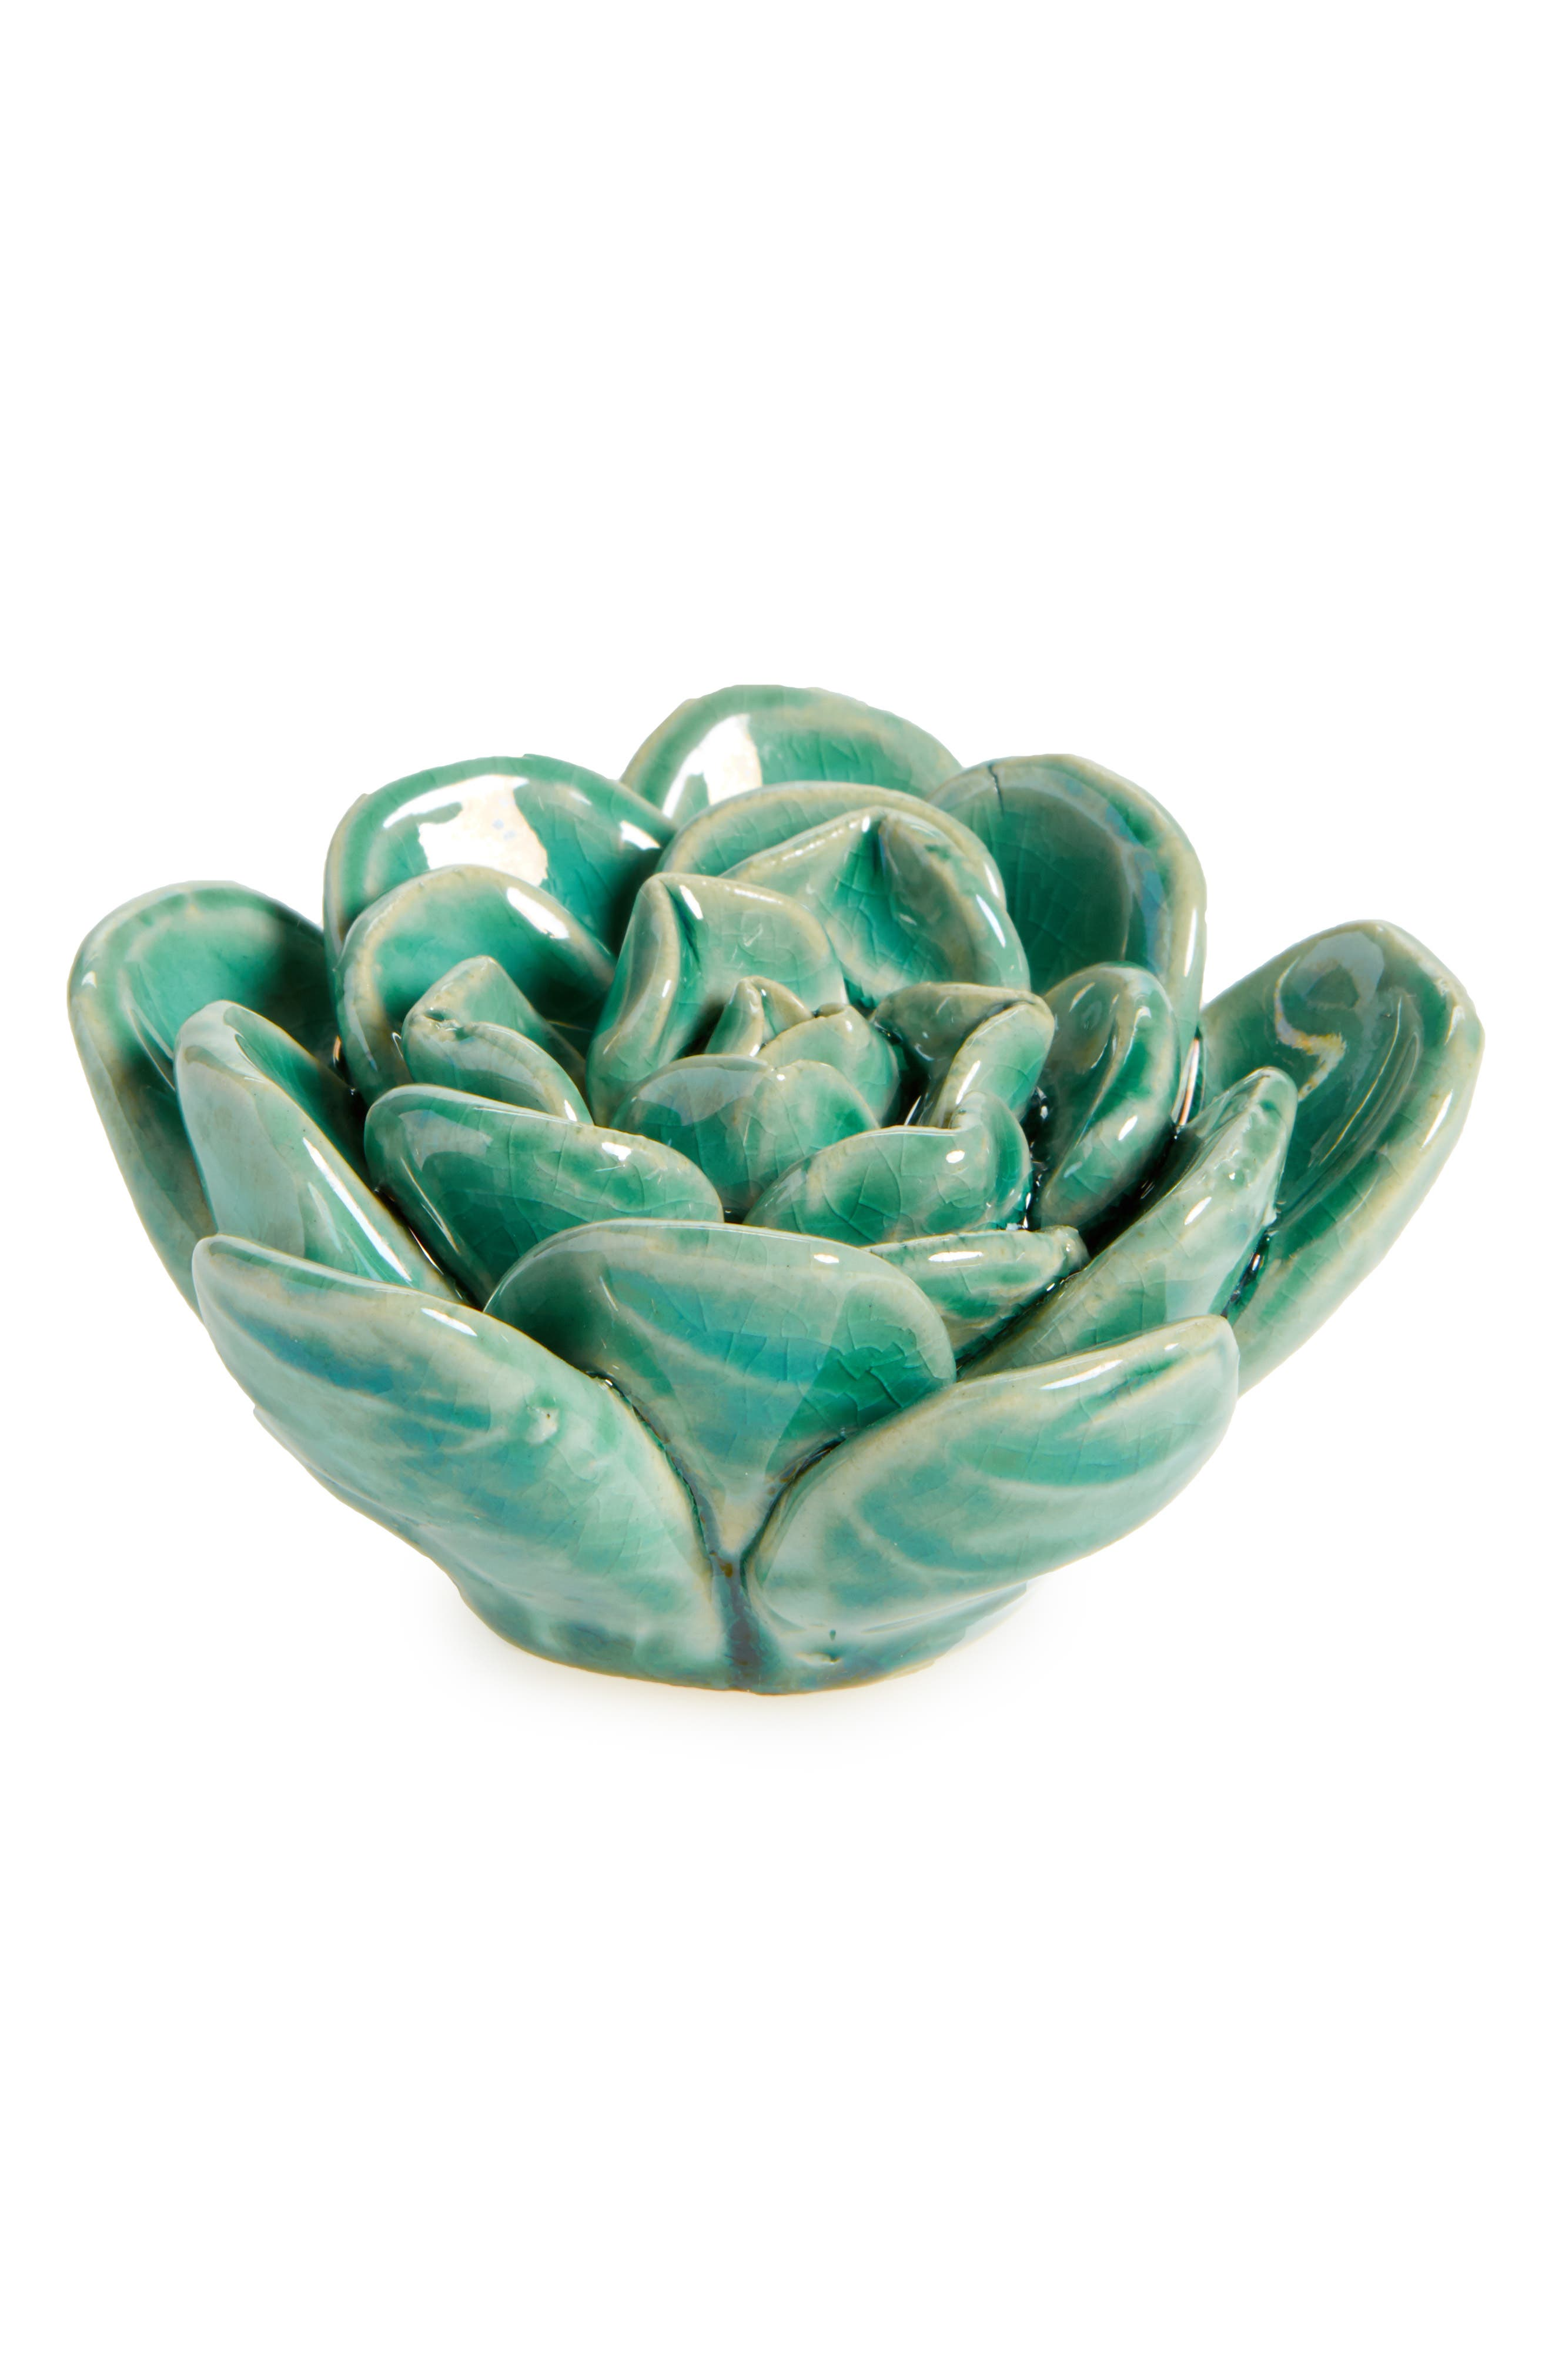 Alternate Image 1 Selected - HomArt Ceramic Succulent